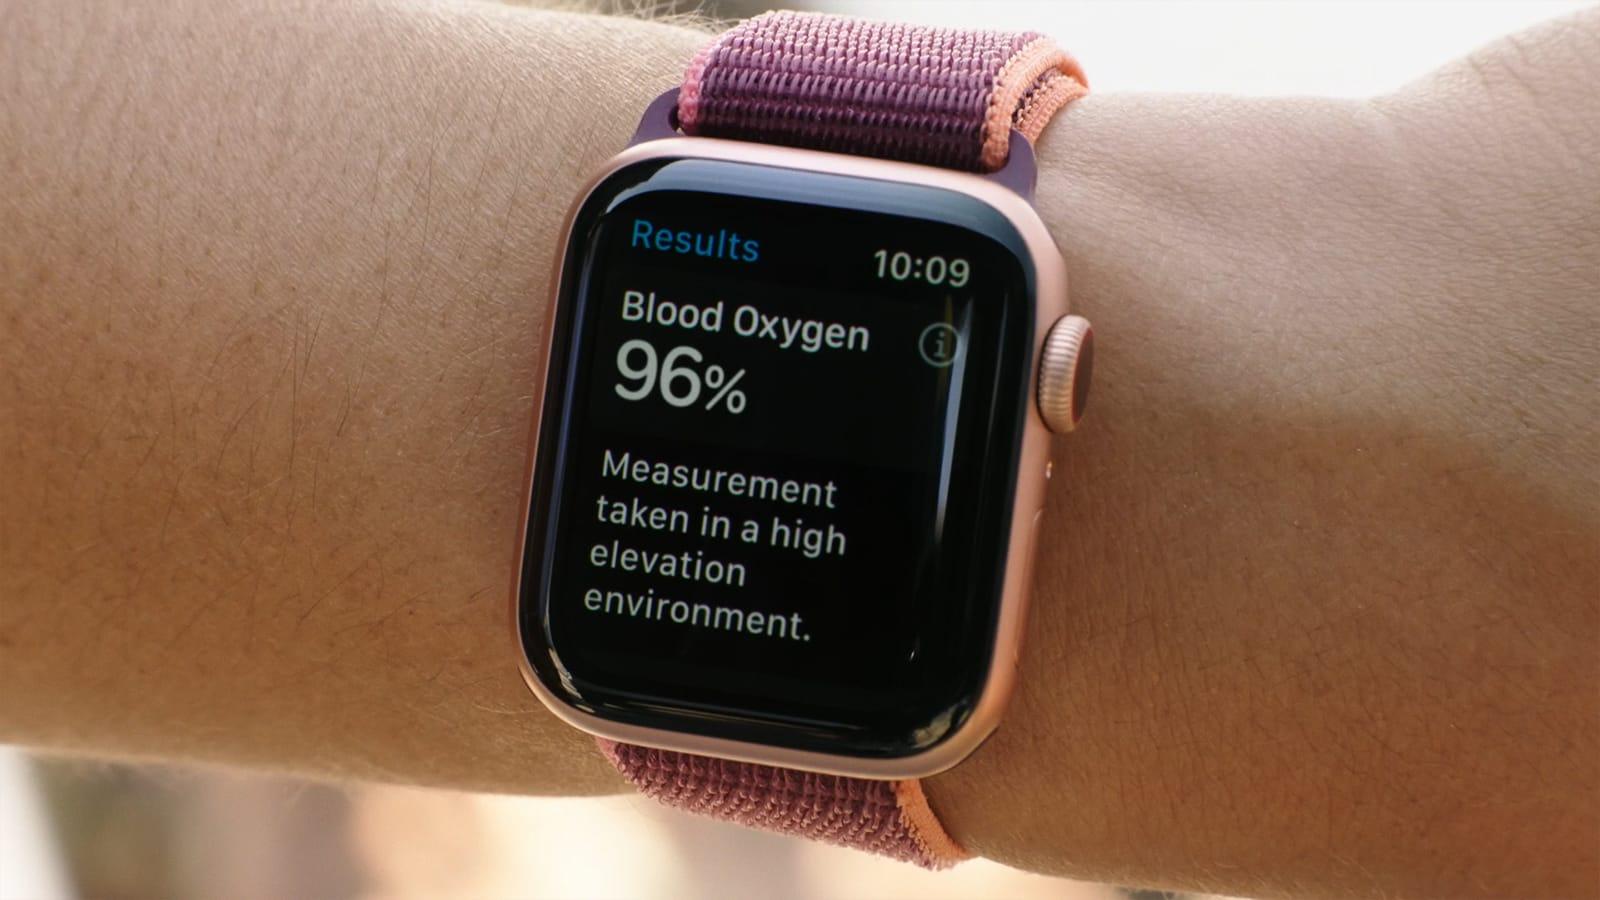 Blood Oxygen Measurements Apple Watch Series 6